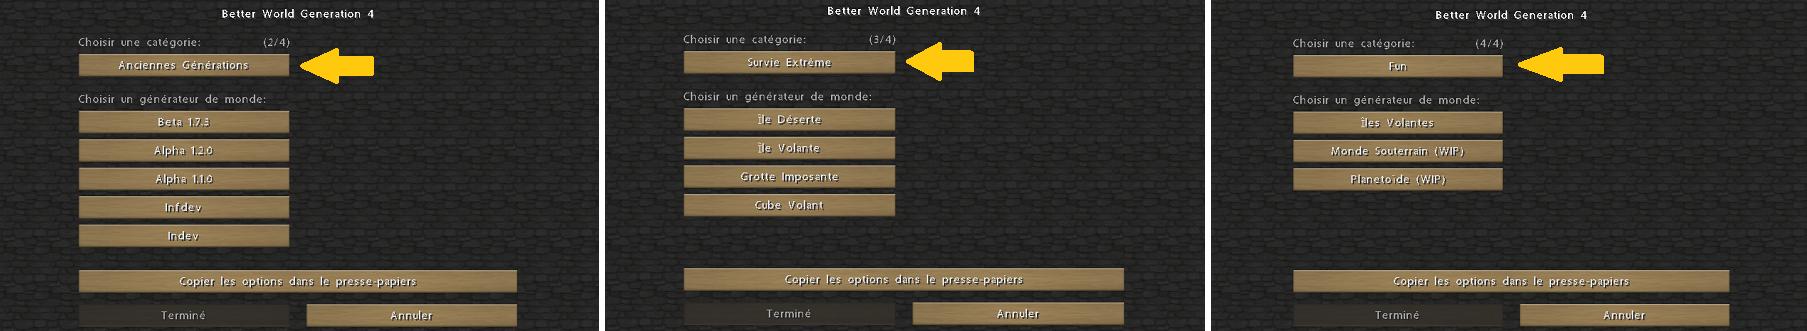 minecraft-mod-better-world-generation-choix-monde